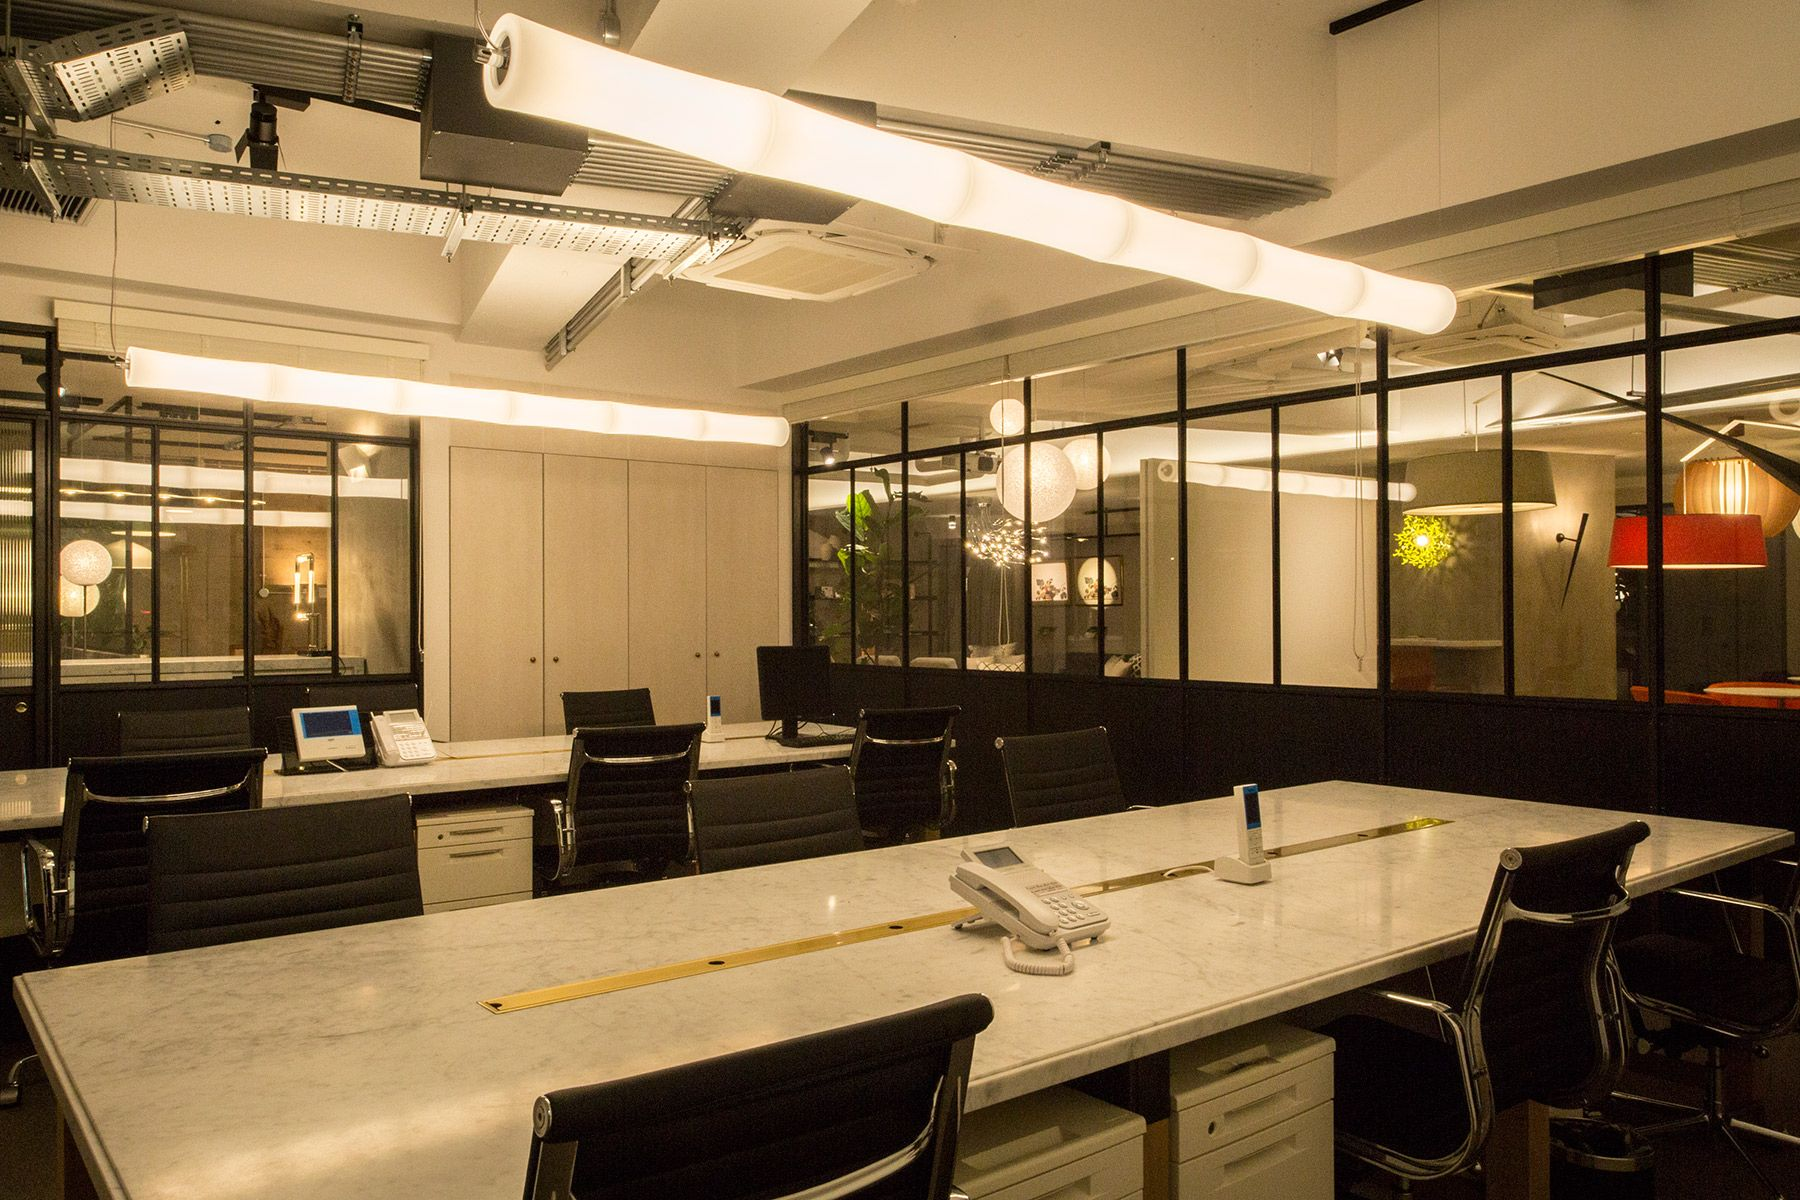 LCI JAPAN STUDIO/青葉台 照明器具ショールーム内観13 オフィス